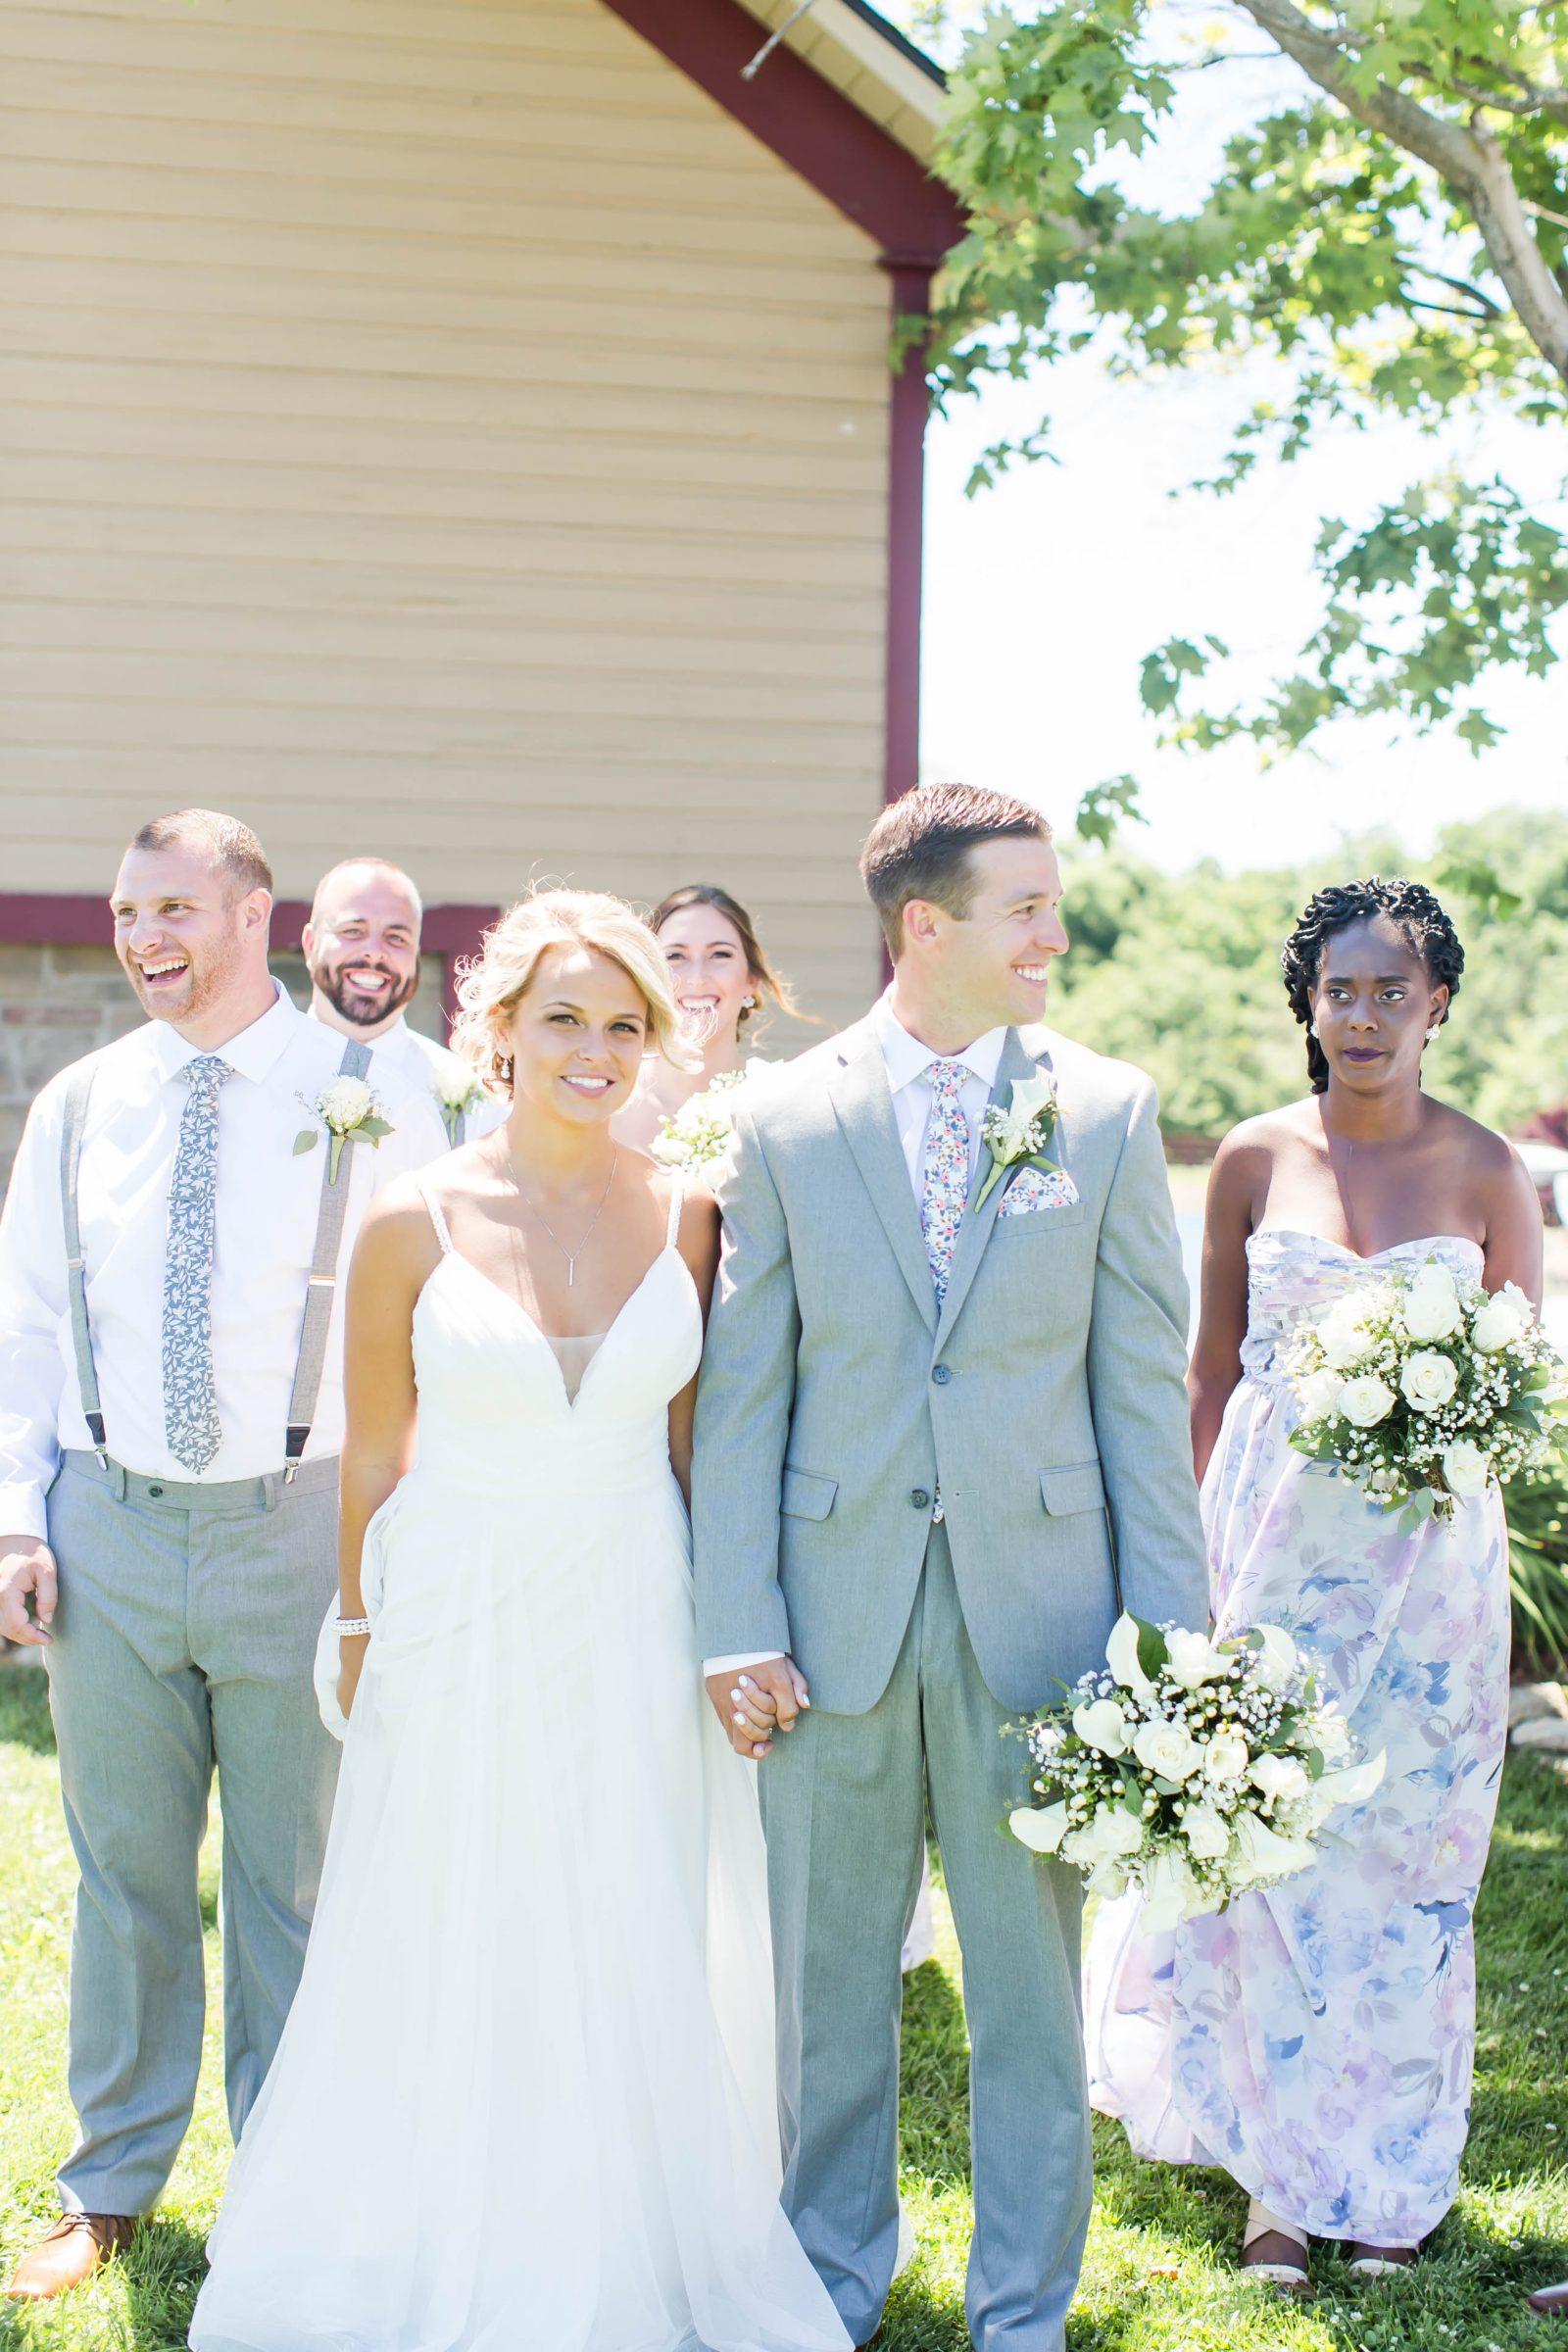 peacock-ridge-summer-wedding-photographer-akron-ohio-loren-jackson-photography-57